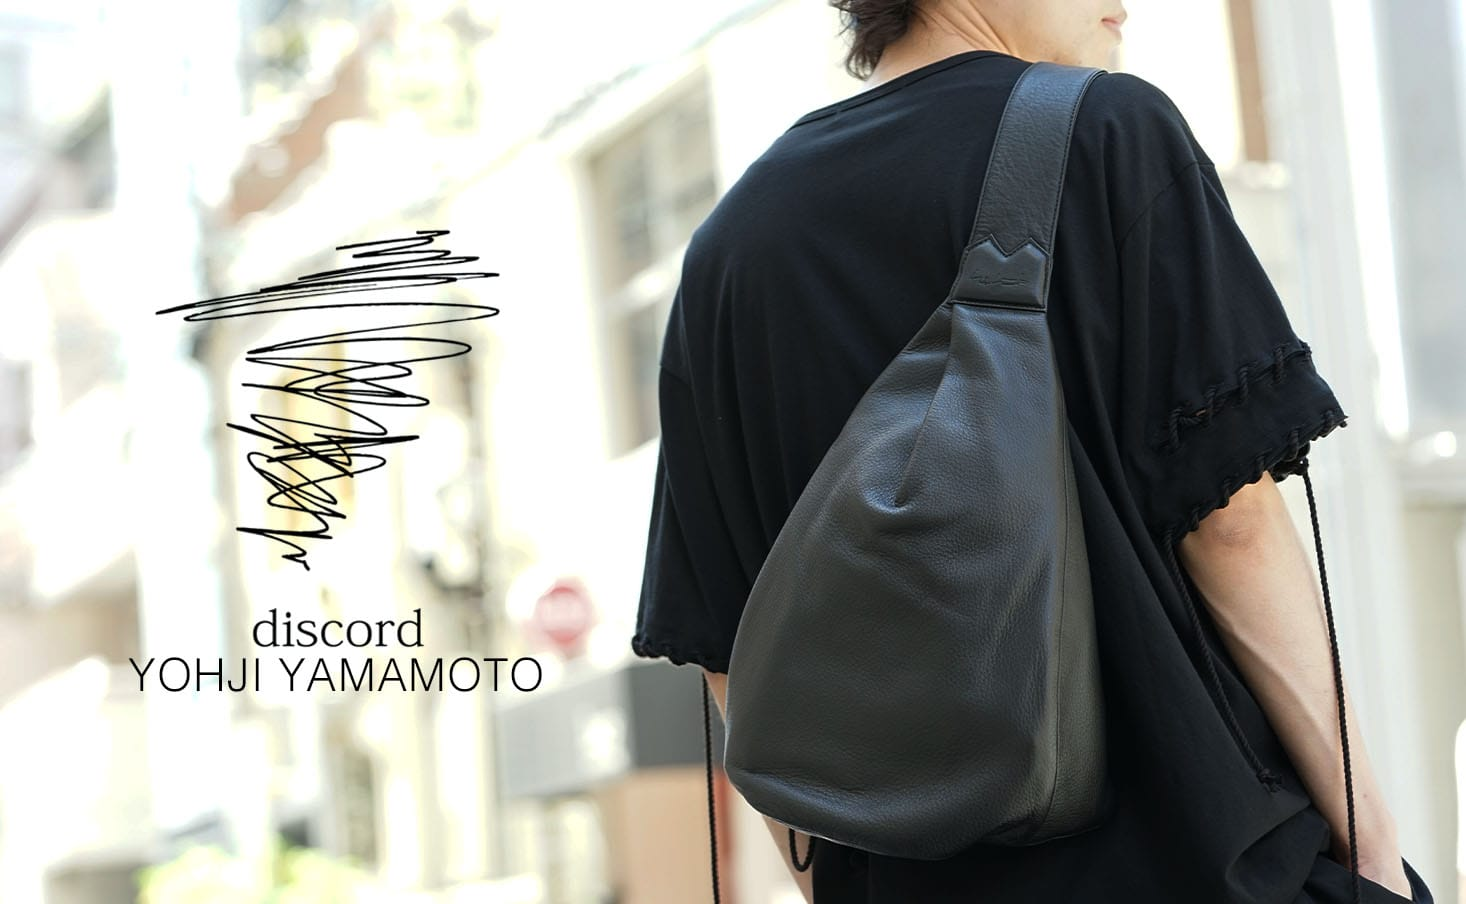 discord yohji yamamoto 2019 Spring Summer Collection